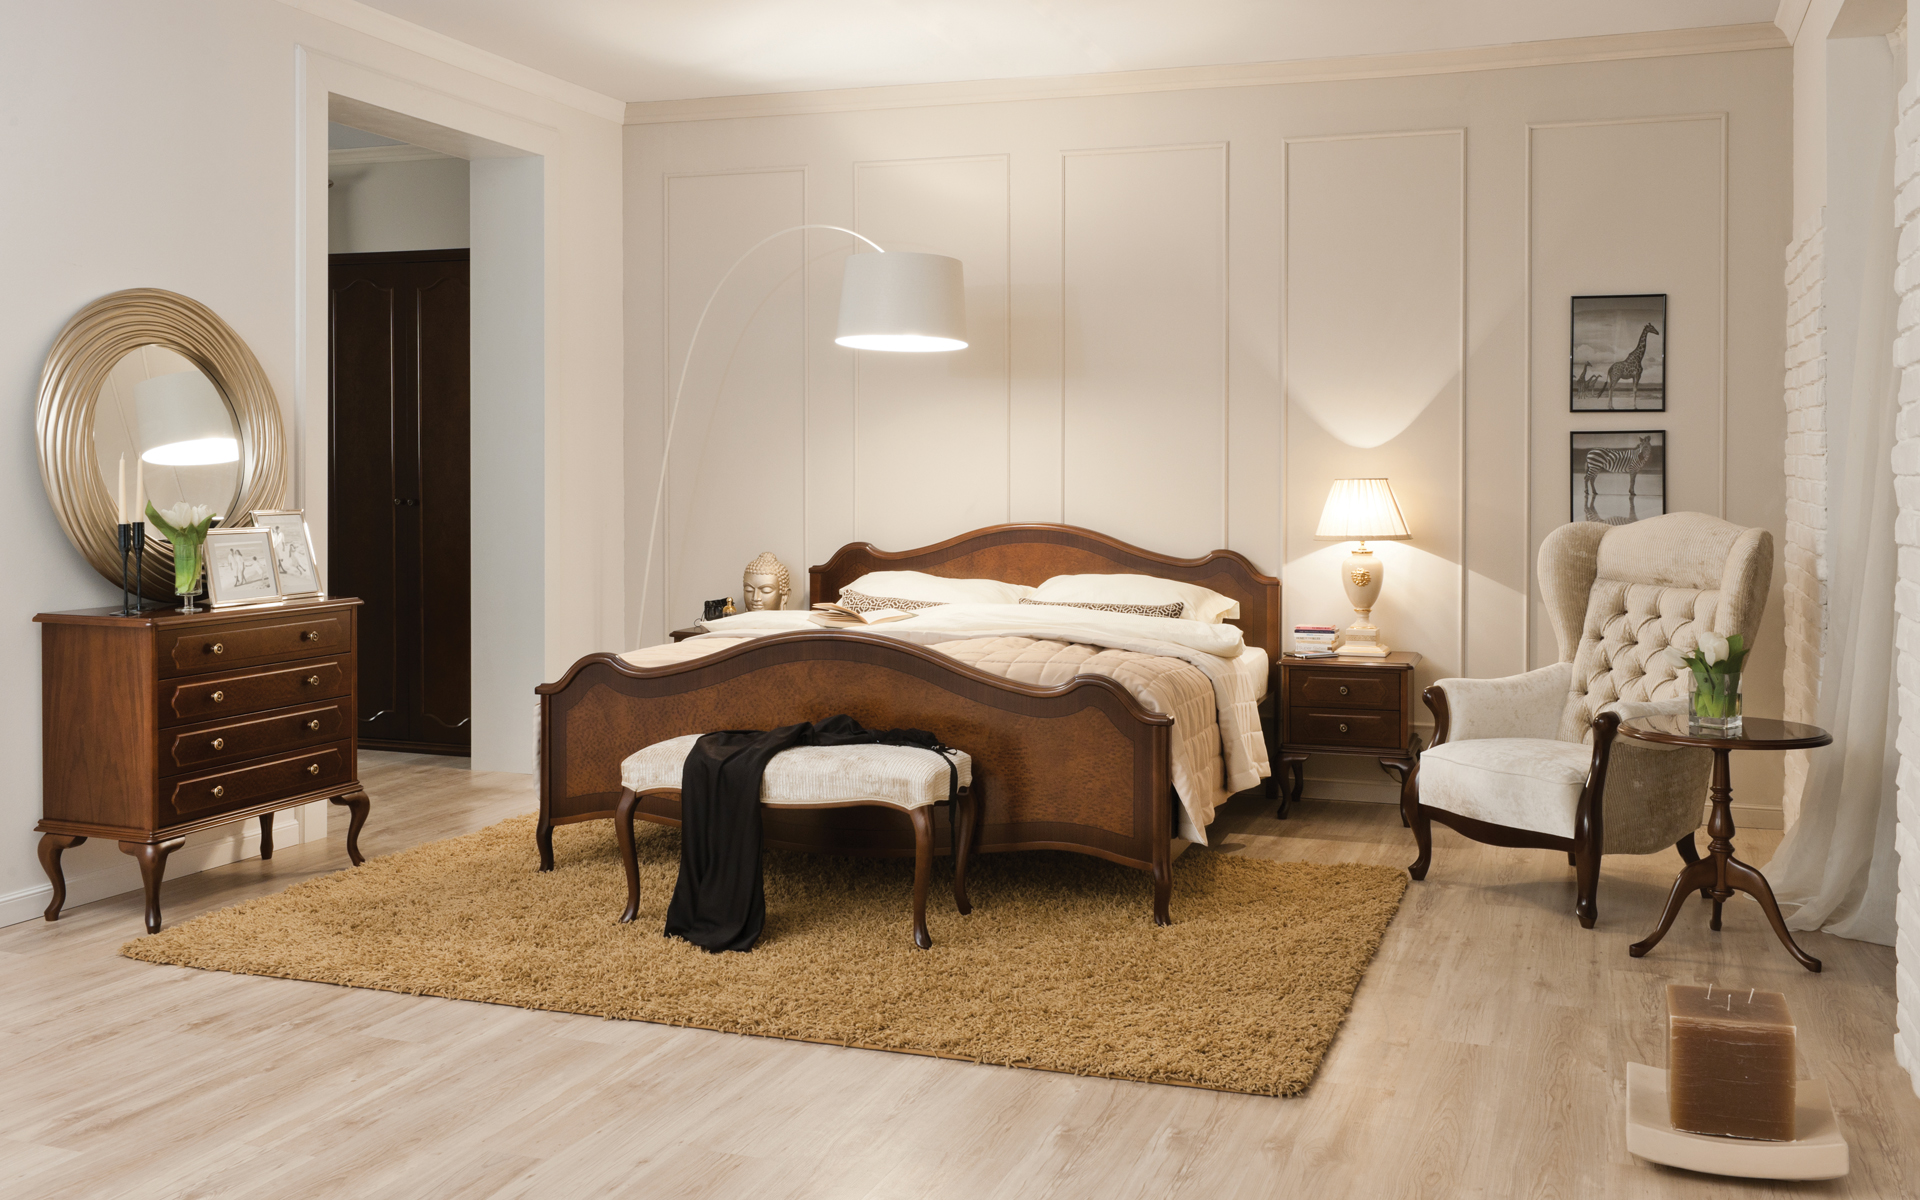 spalnica_bedroom_schlafzimmer_Barok_klasicno-pohistvo_classic-furniture_Klassischen-Moebel_Barock_2a